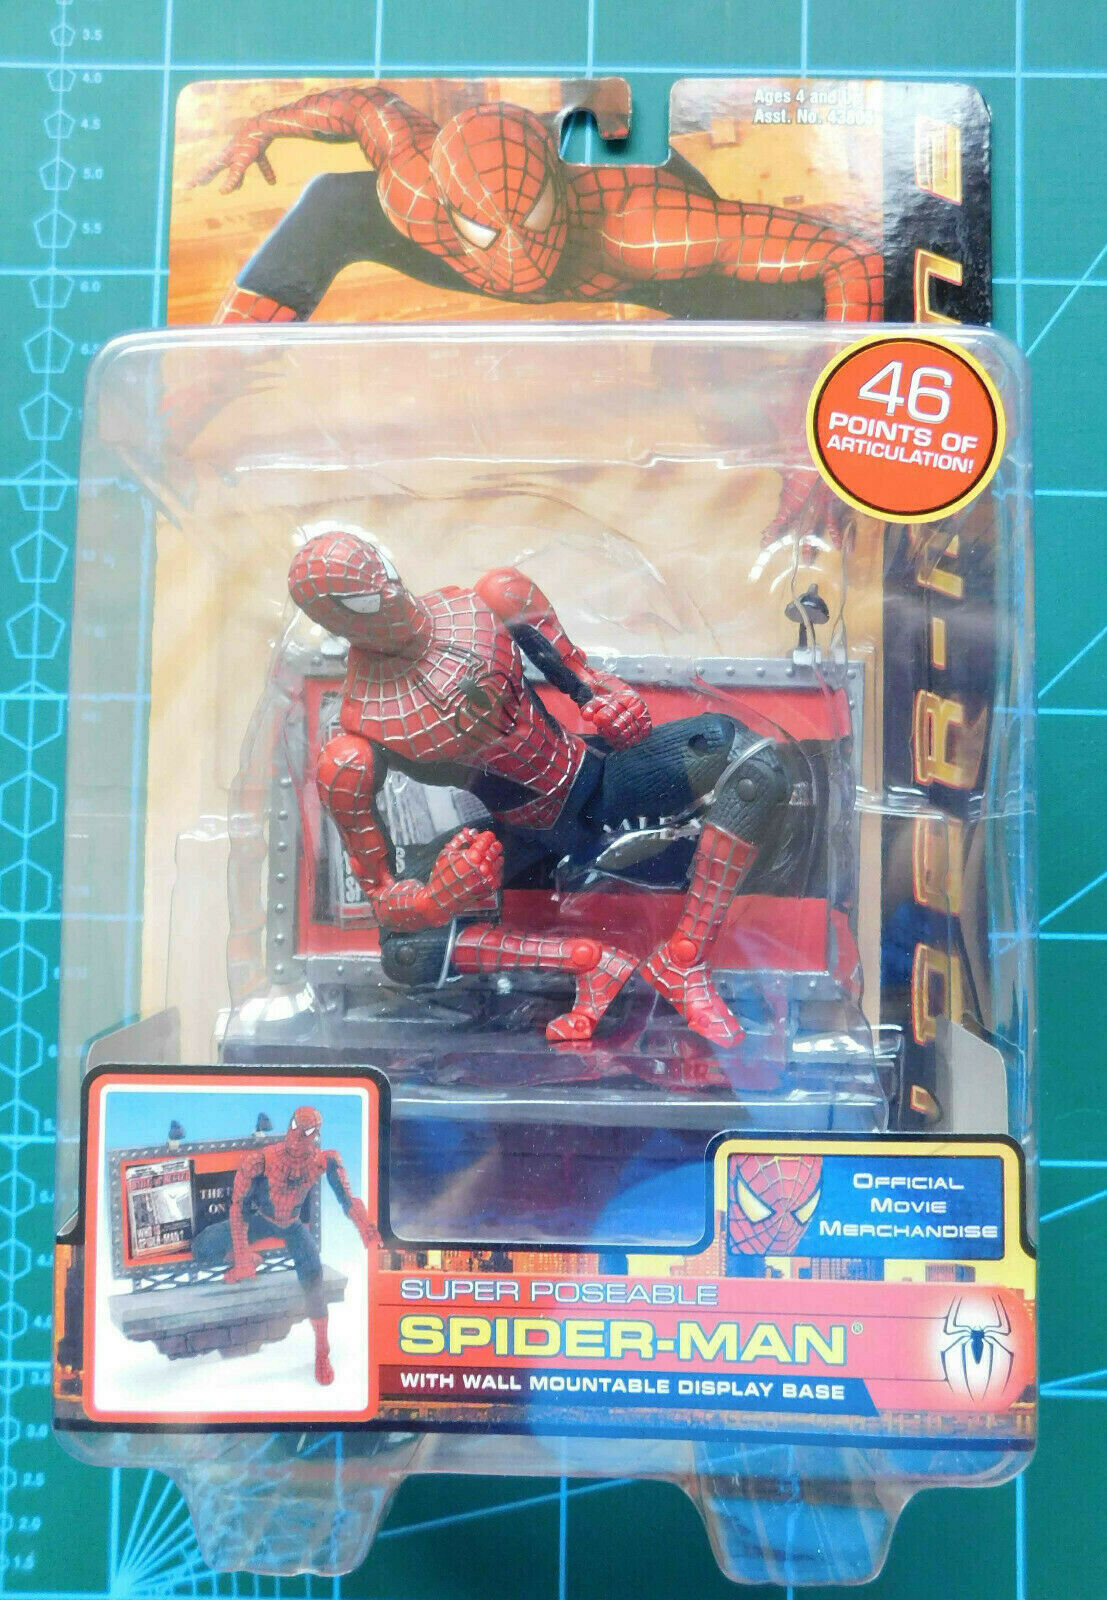 Hombre Araña 2 súper Poseable Spider-Man Figura Marvel JugueteBiz 2004 leyendas